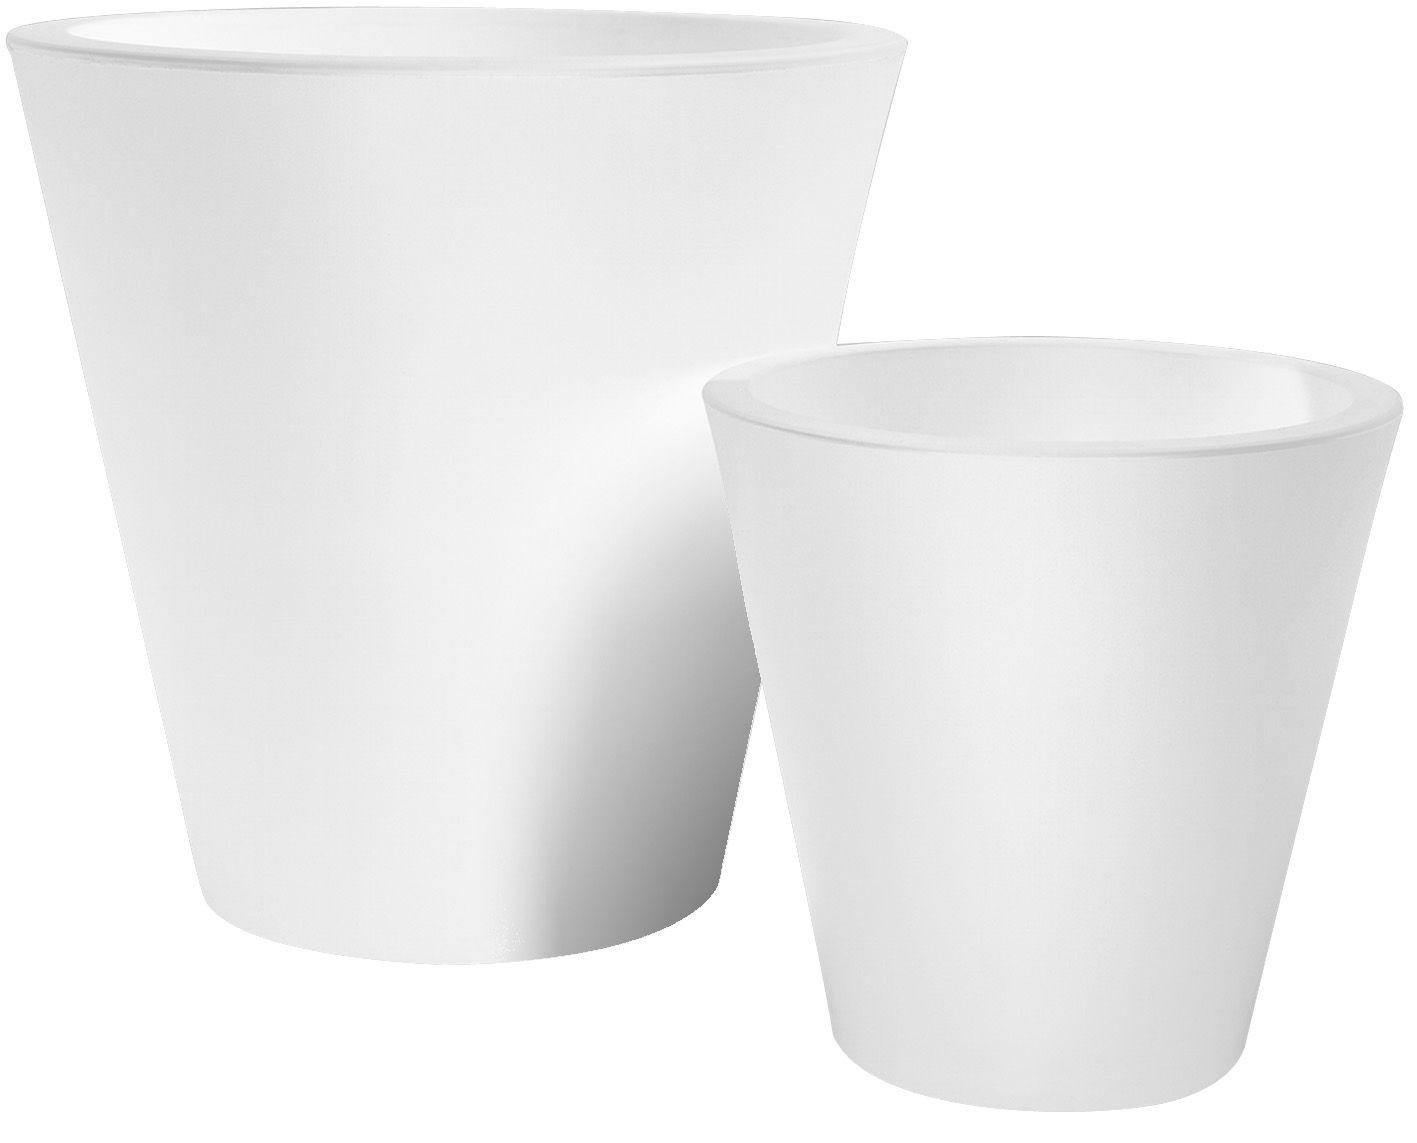 Outdoor - Töpfe und Pflanzen - New Pot Blumentopf H 70 cm - Serralunga - Weiß - Polyäthylen